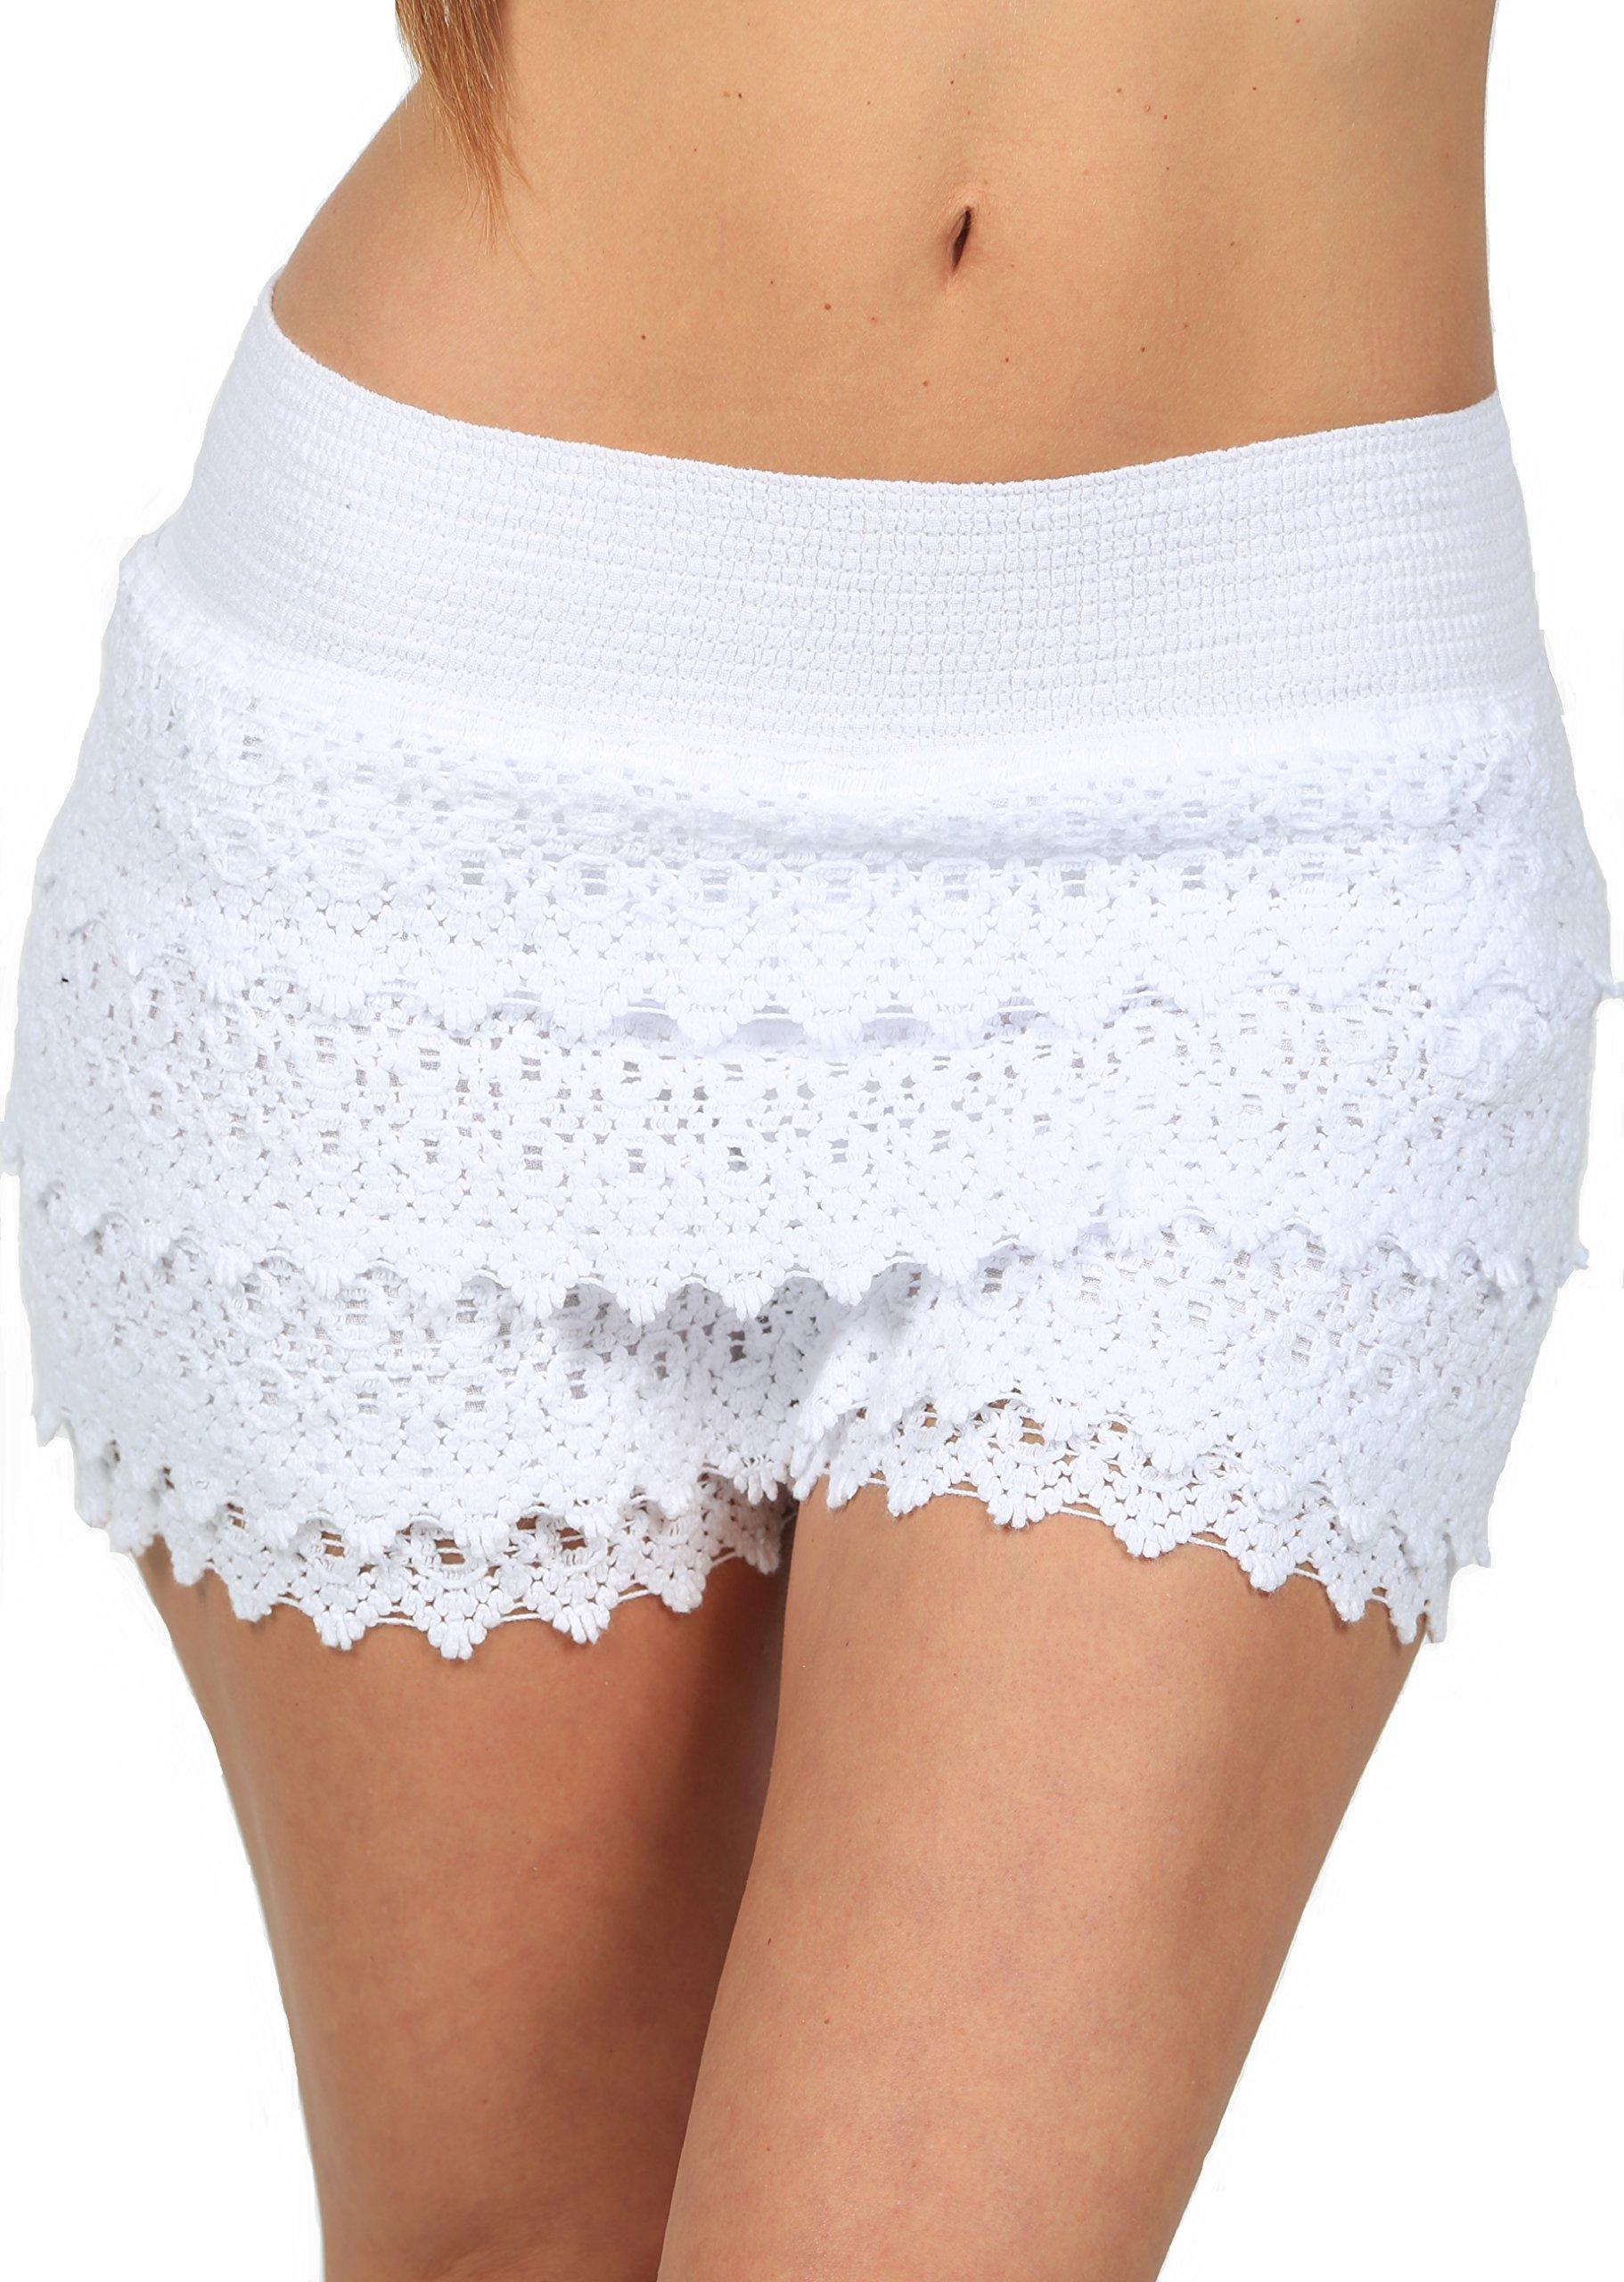 PURE COTTON Women's Lace Shorts Casual Cotton Crochet Summer Beach Miniskirts (White, Large)